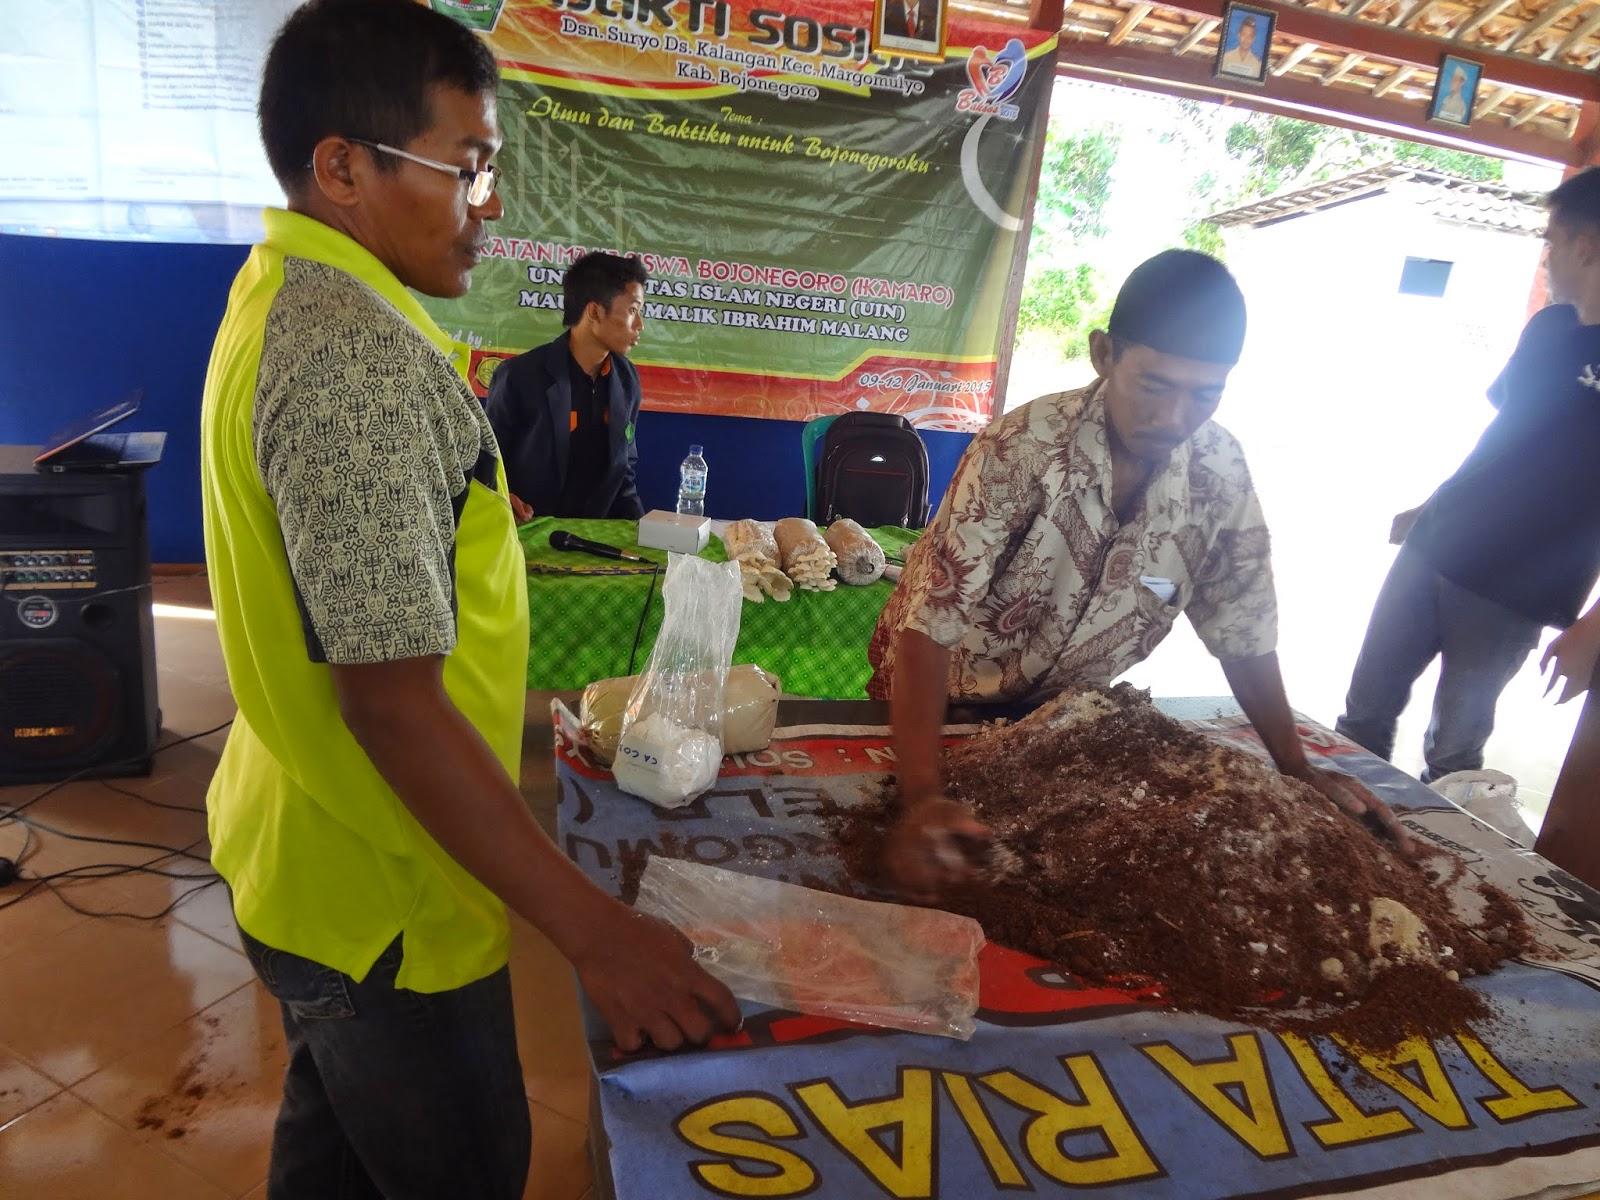 Pelatihan Budidaya Jamur Tiram, Salah Satu wujud Kepedulian IKAMARO Terhadap Ekonomi Kreatif Masyarakat Bojonegoro